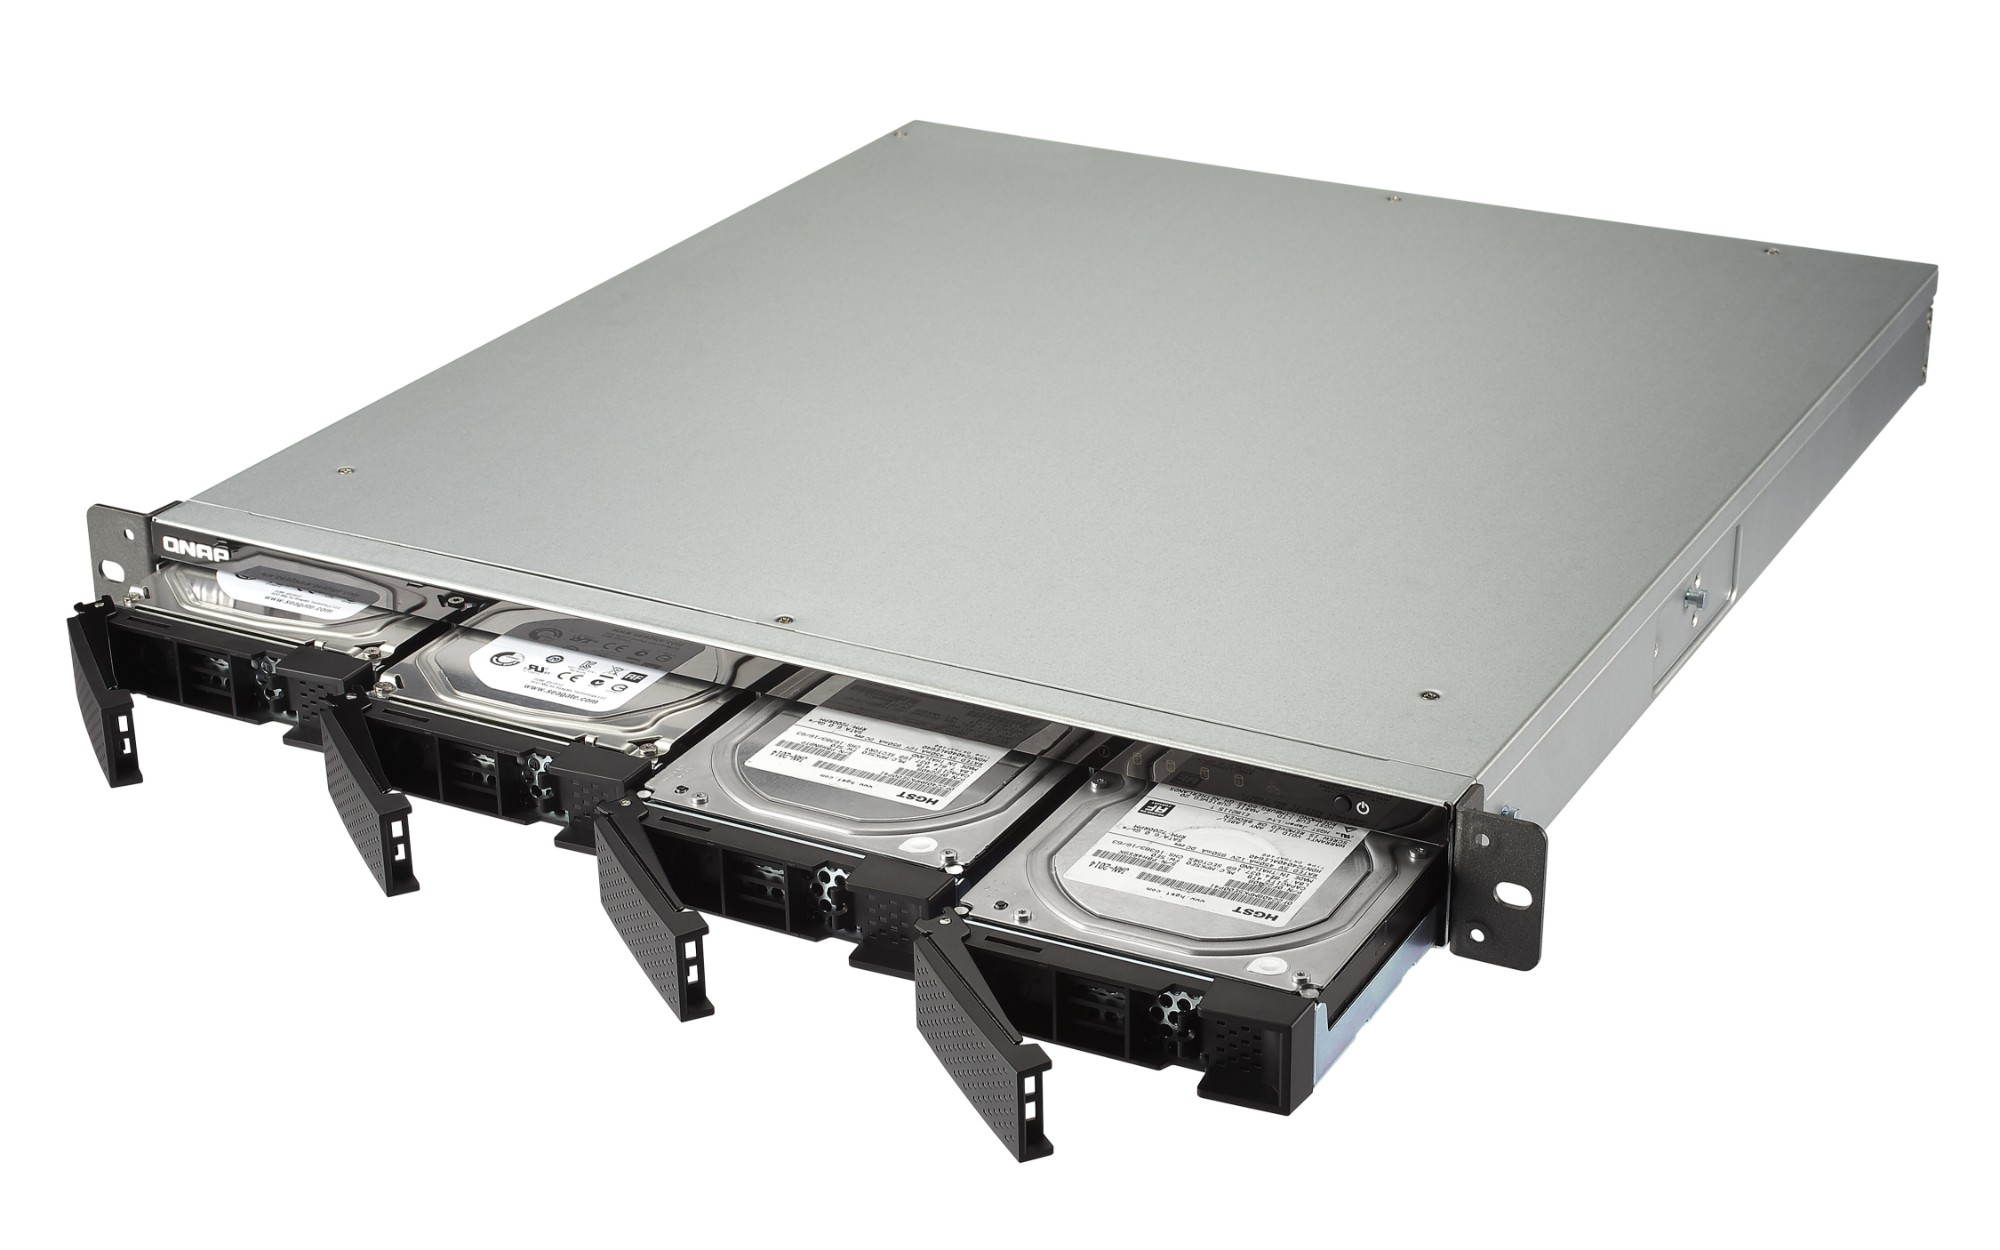 QNAP TS-453BU-RP-4G 24TB 4x6TB Seagate IronWolf Pro 4 Bay NAS Rackmount  Ethernet LAN Rack (1U) Black,Grey